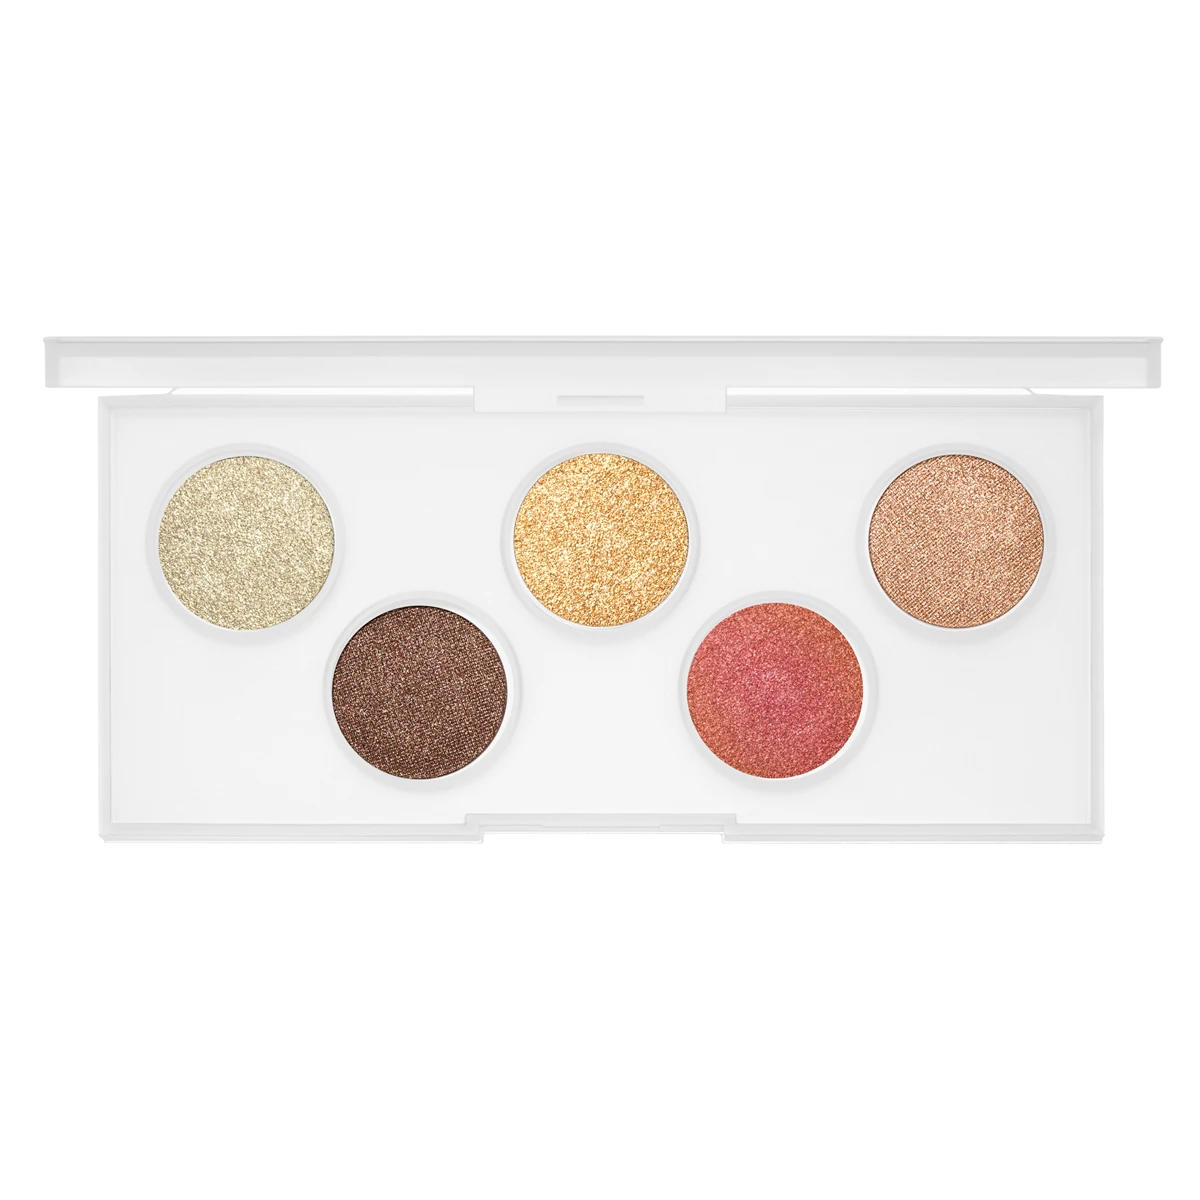 Pat McGrath Labs Eye Ecstasy Eyeshadow Palette Sublime